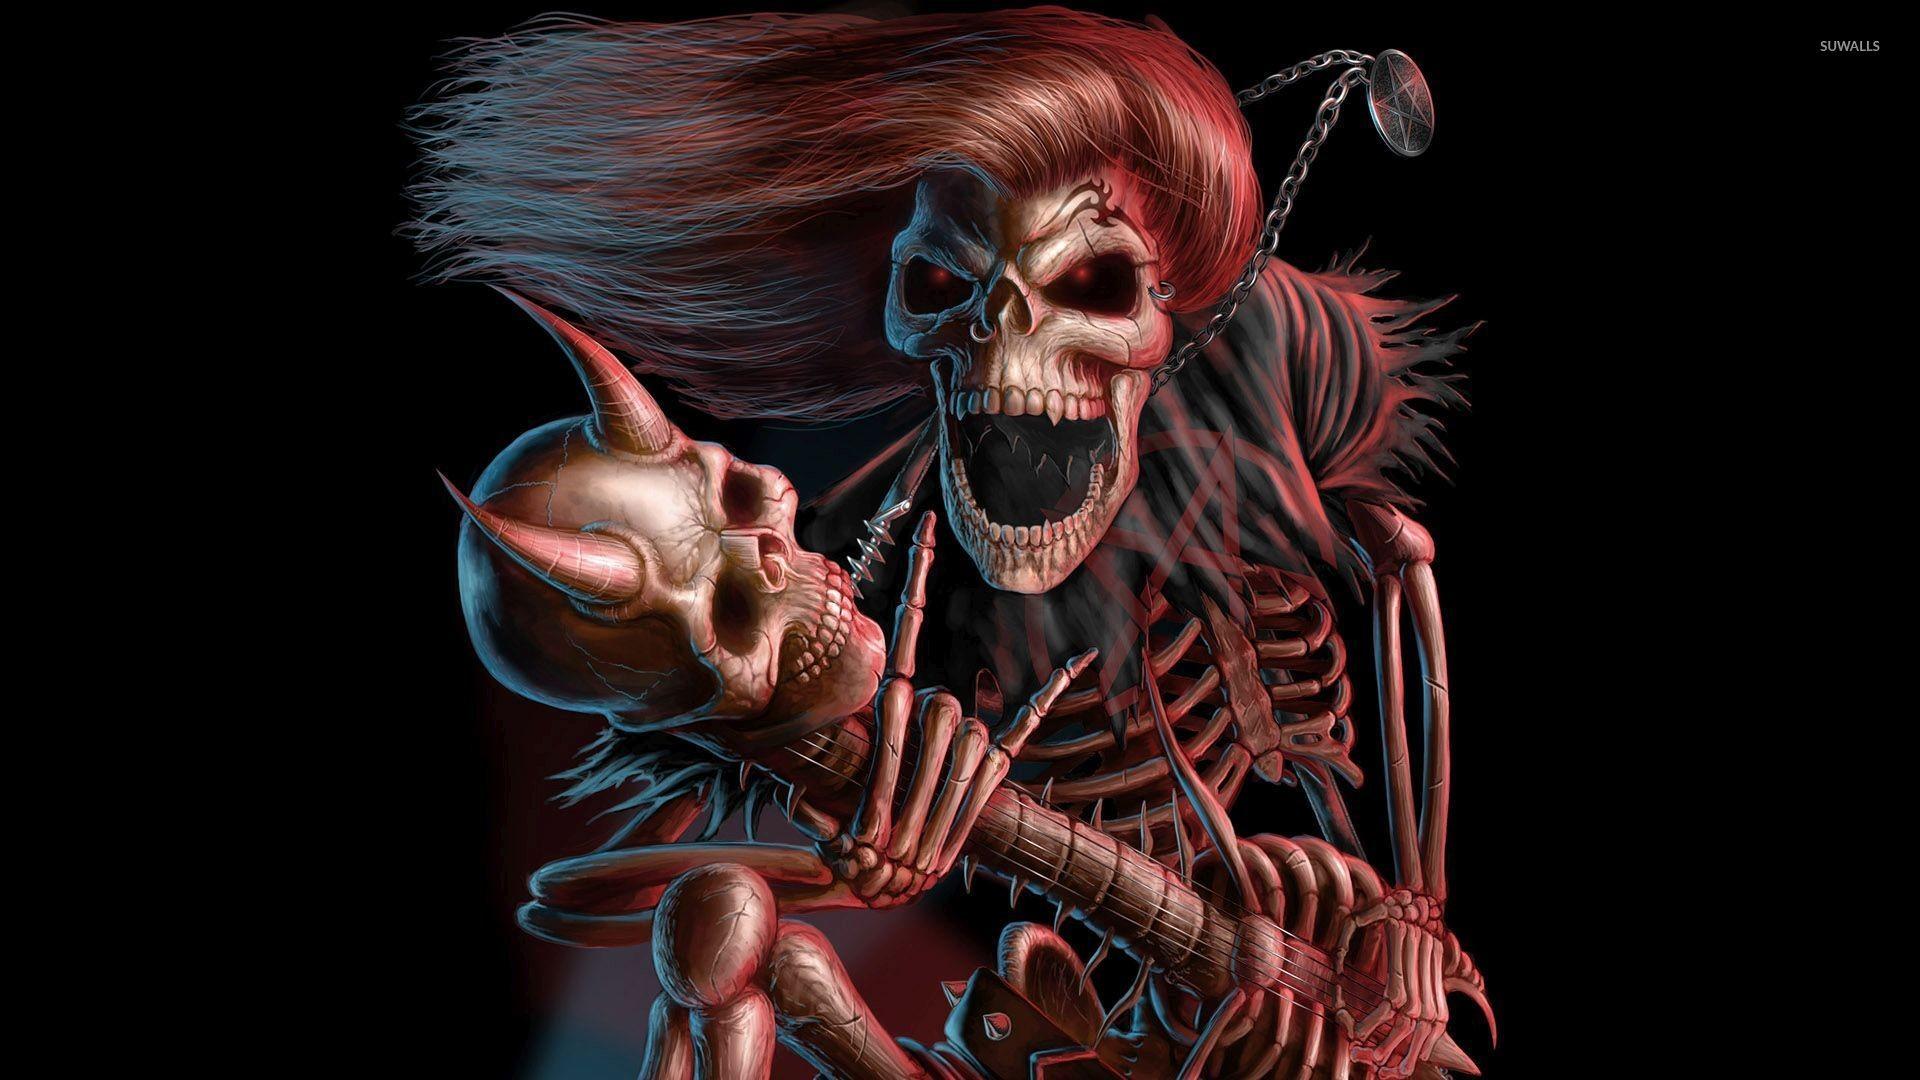 Res: 1920x1080, Scary skeleton wallpaper